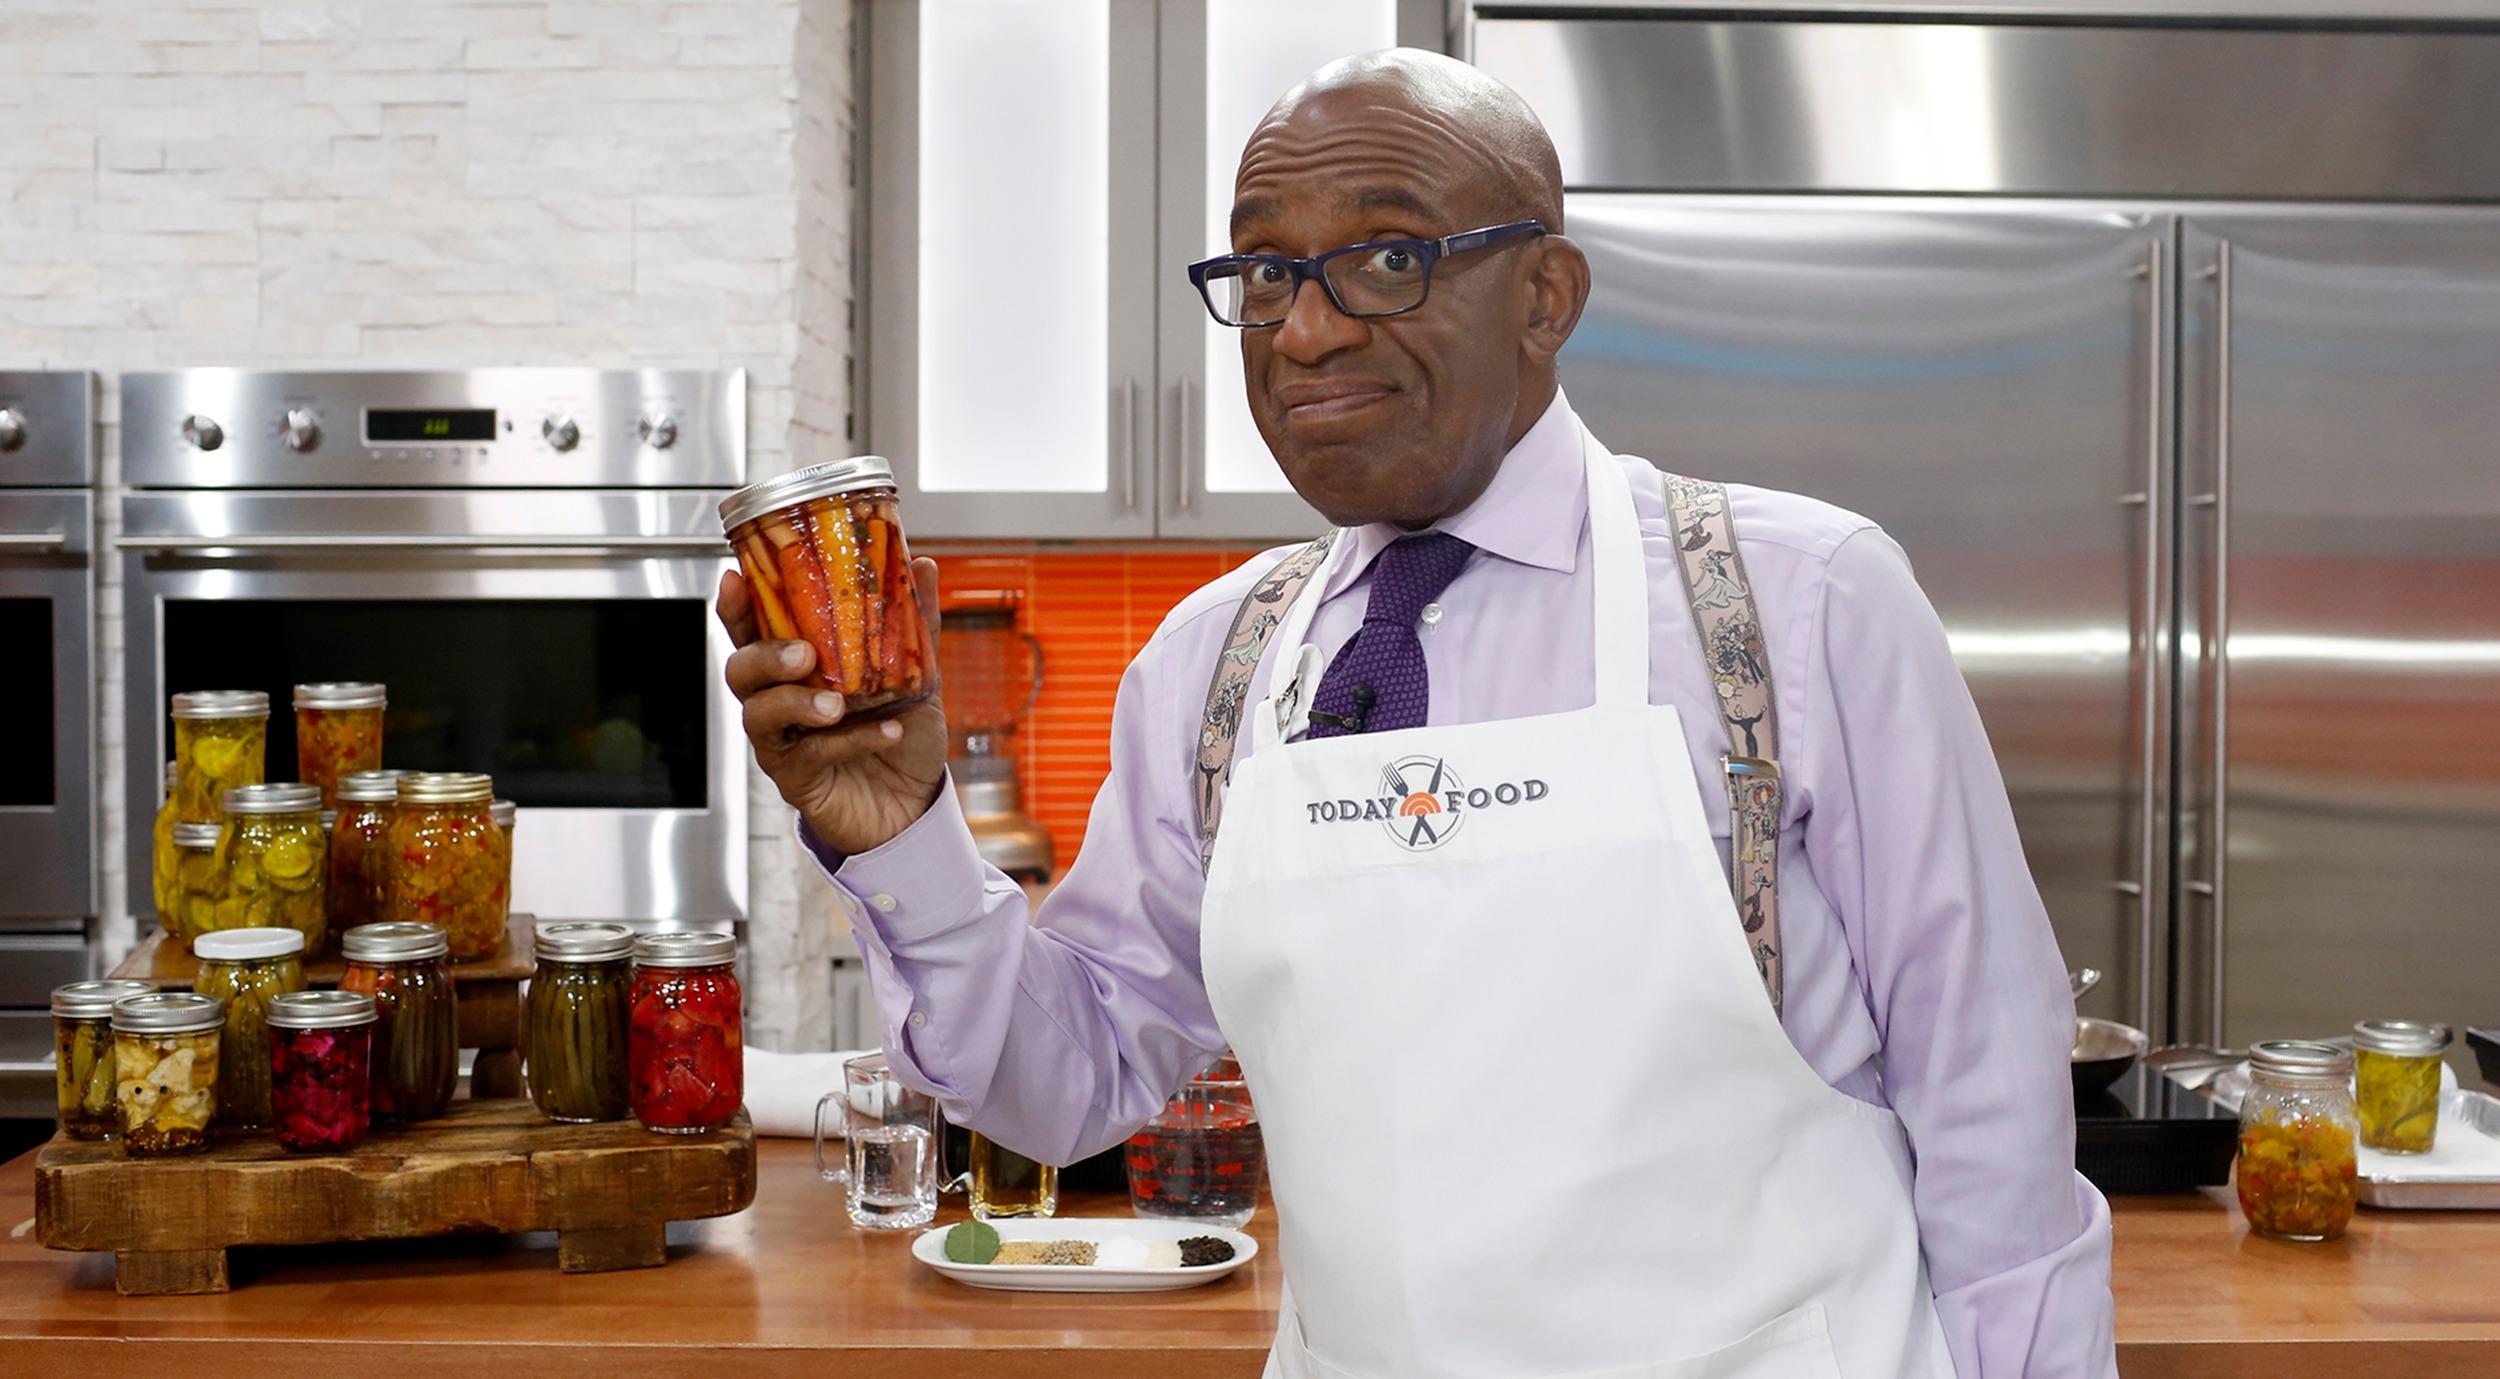 Al Roker holding pickle jar